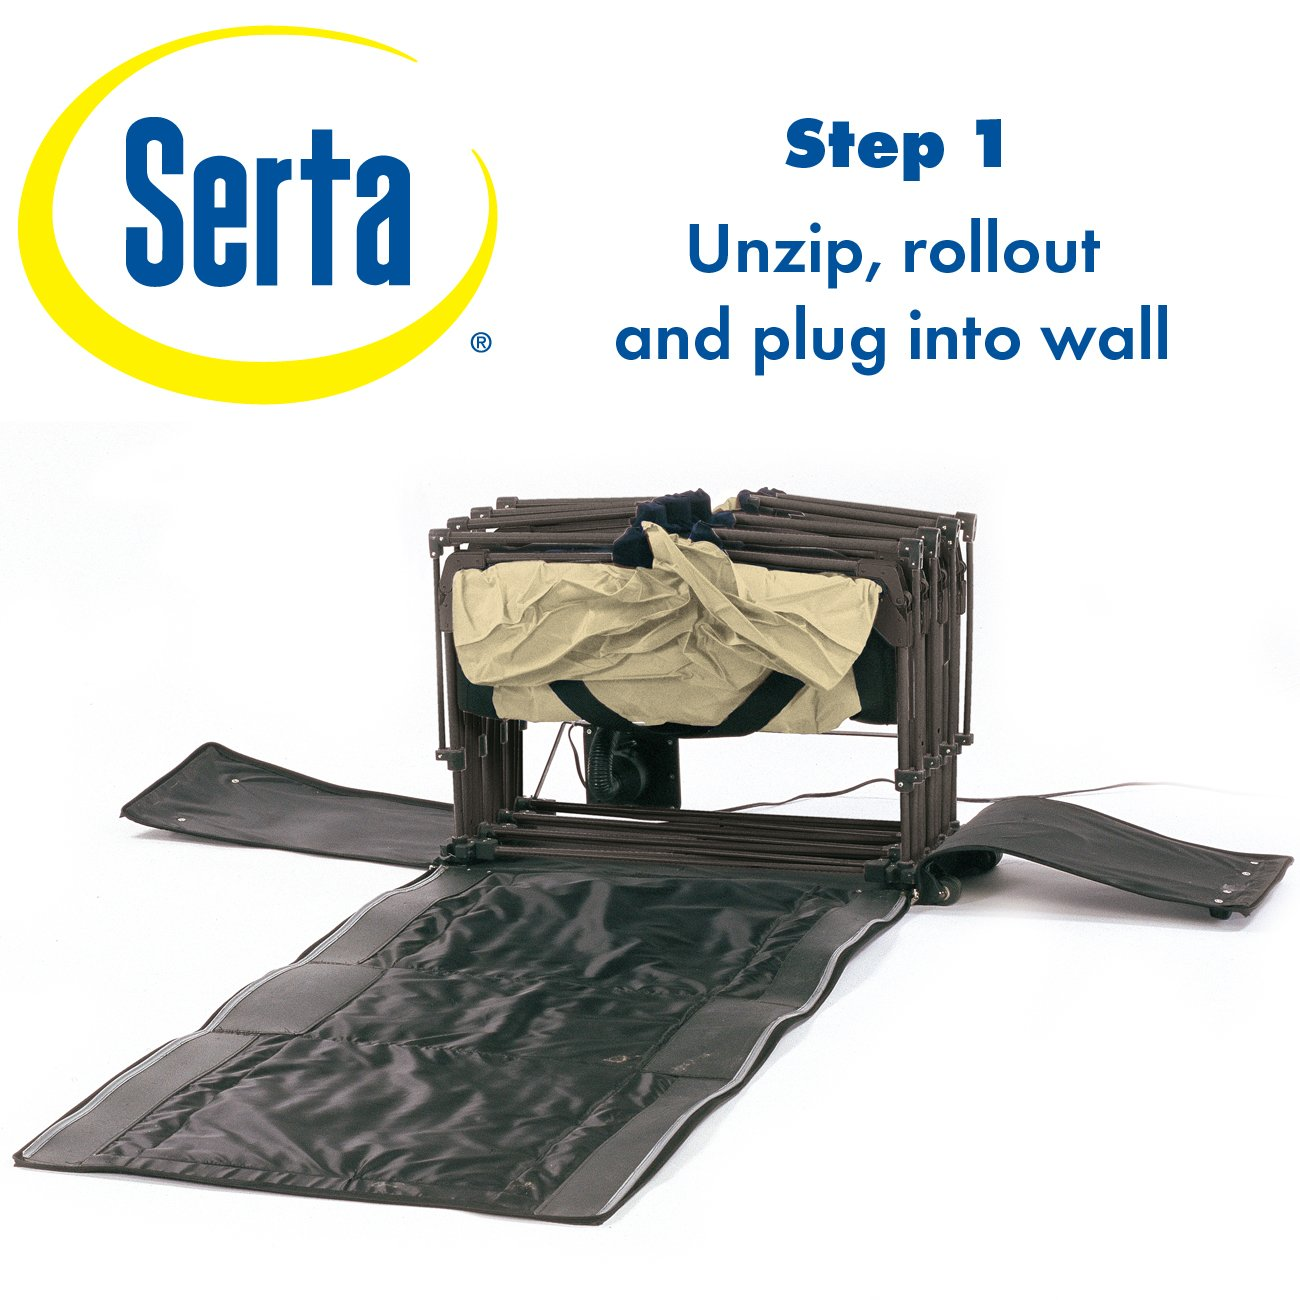 Amazon.com: Serta EZ Air Mattress with Never Flat Pump: Sports & Outdoors